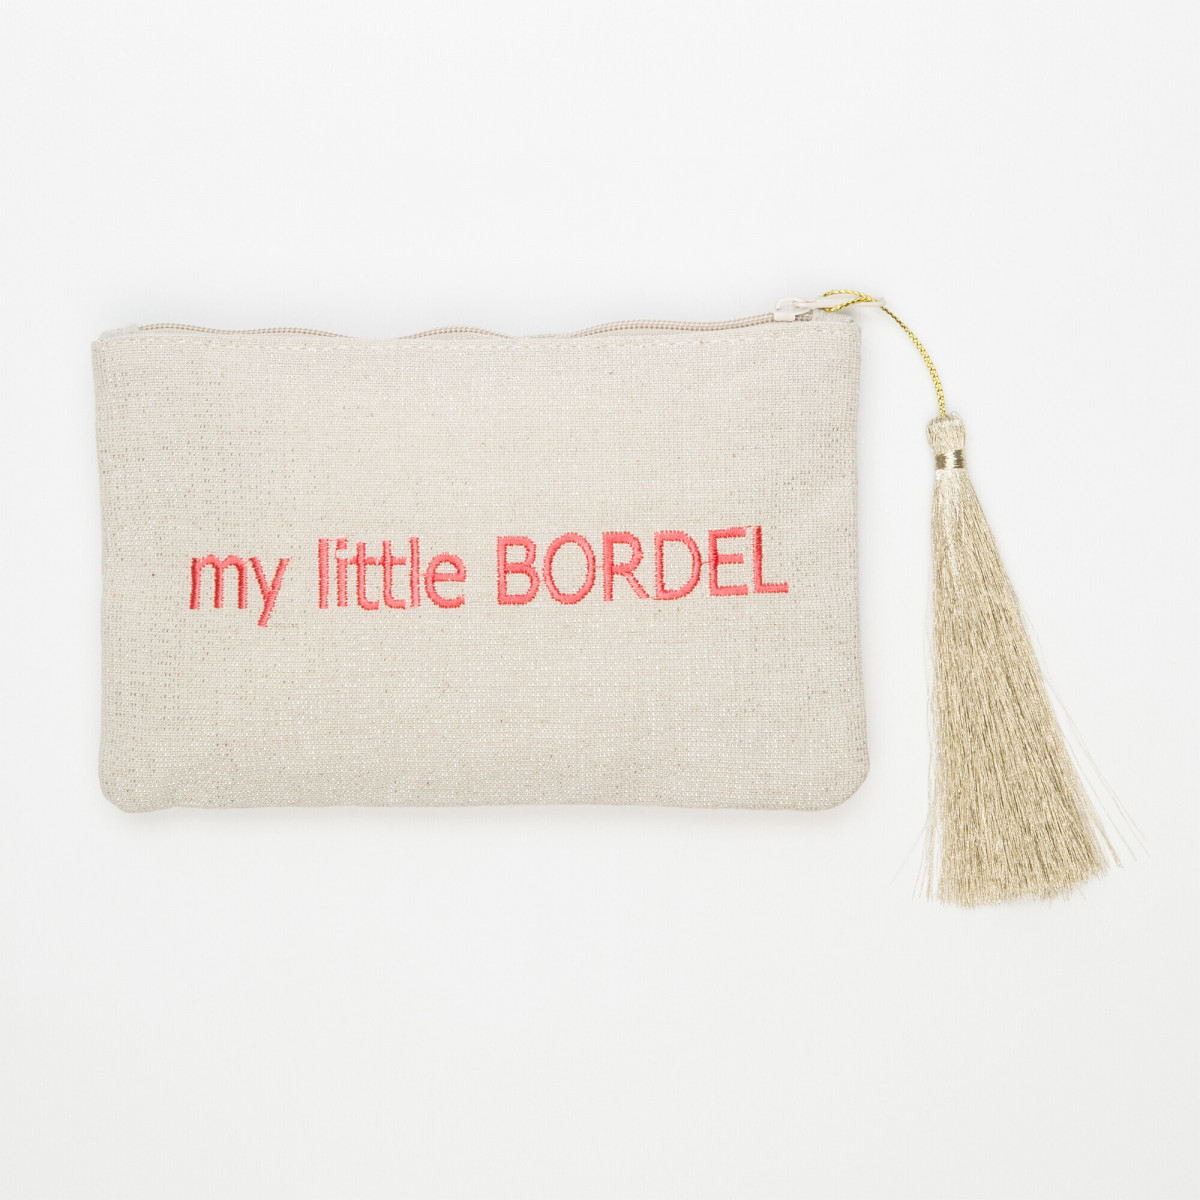 Petite pochette à message beige brodée MY LITTLE BORDELrose